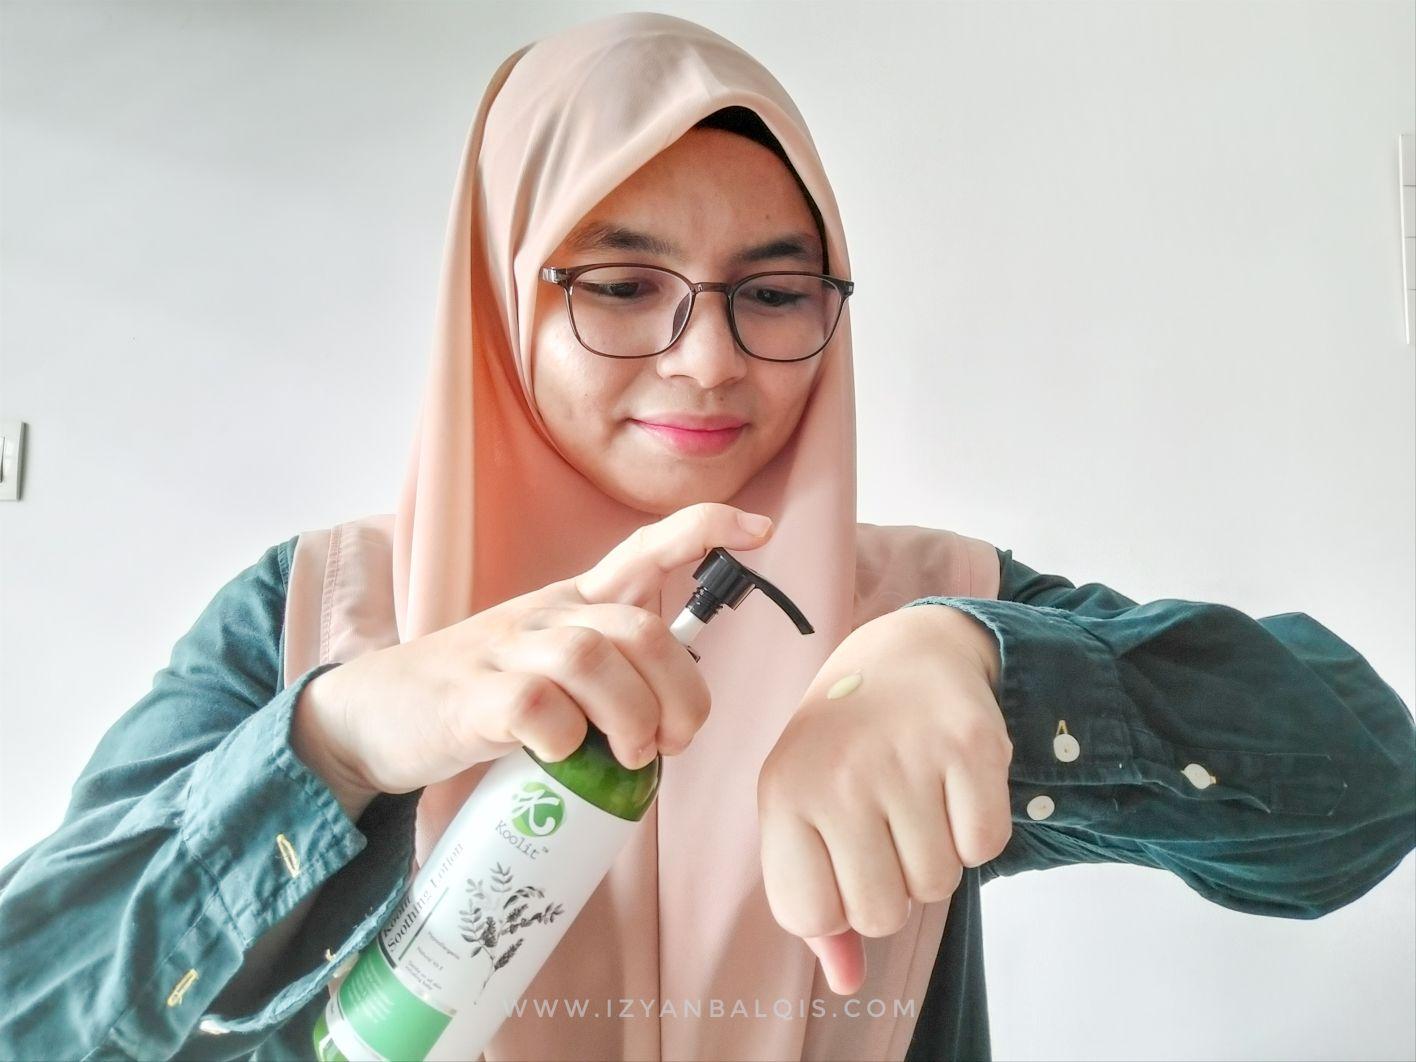 Produk Koolit Malaysia Bagus Atasi Kulit Kering Bermasalah